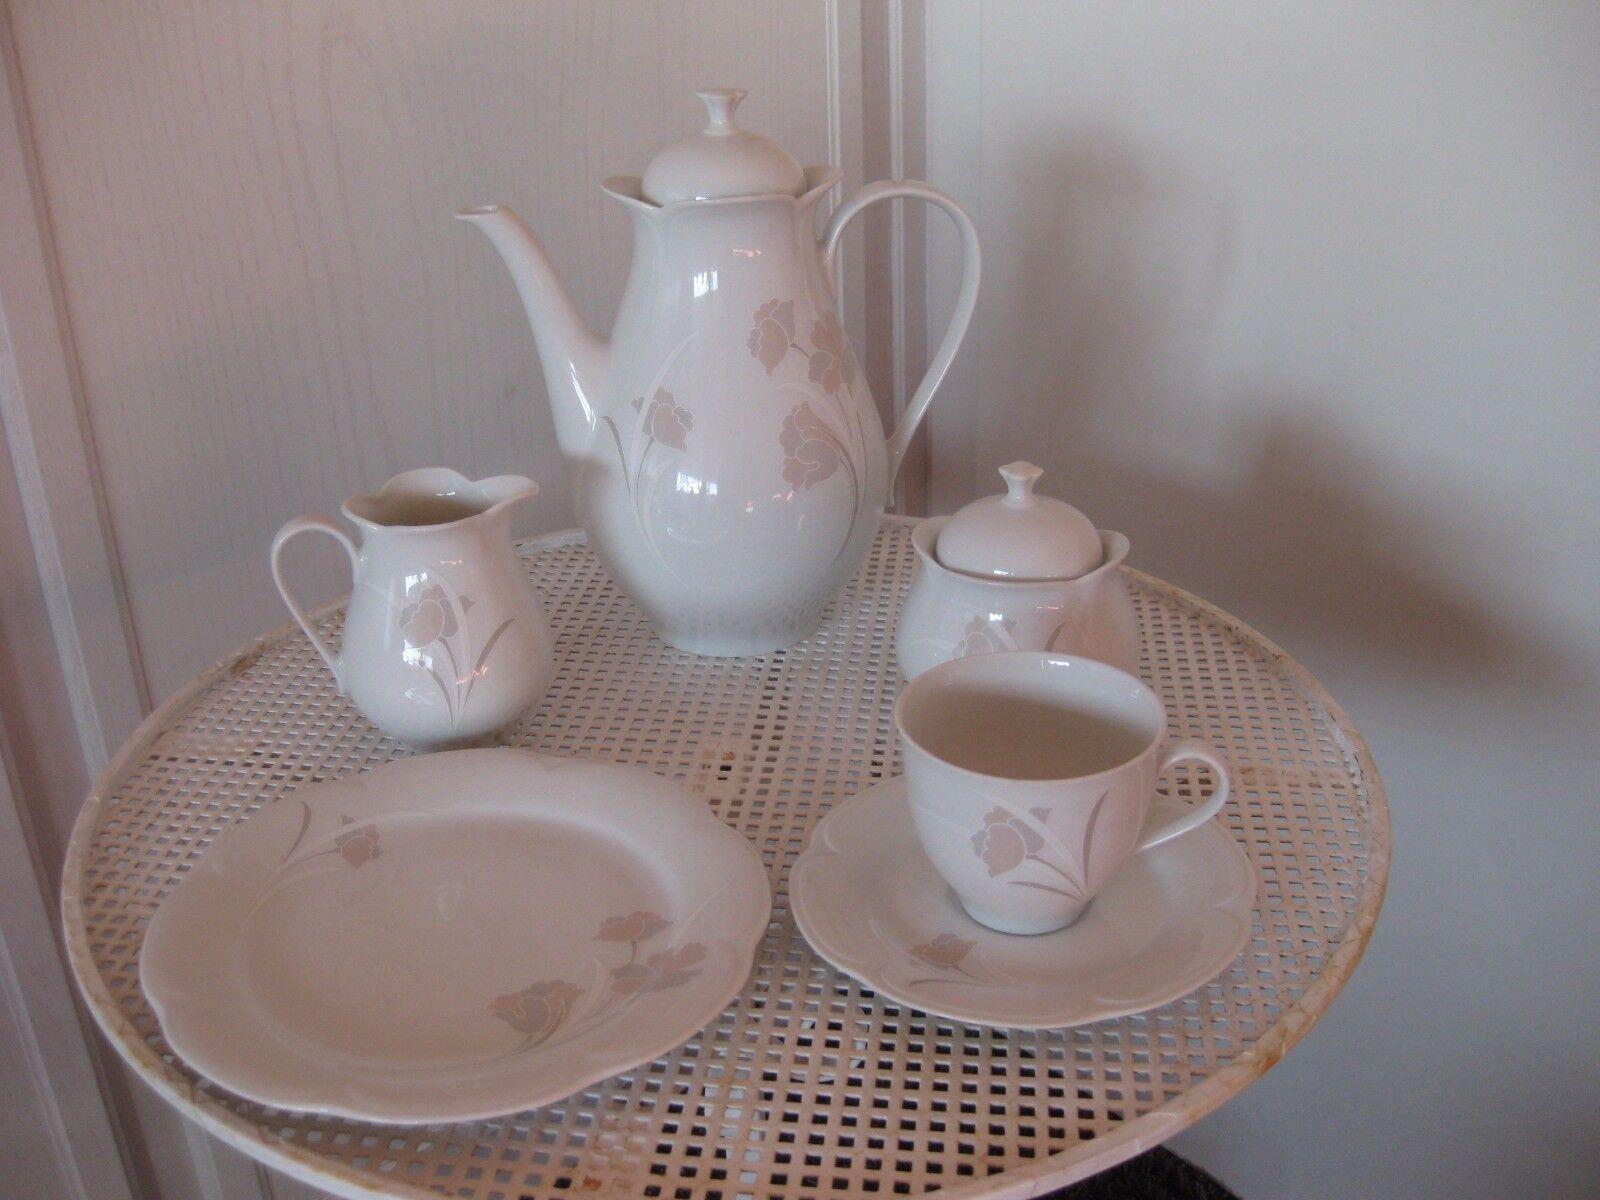 For mano Bavaria Germany 21-teiliges 21-teiliges 21-teiliges Kaffeeservice b96183